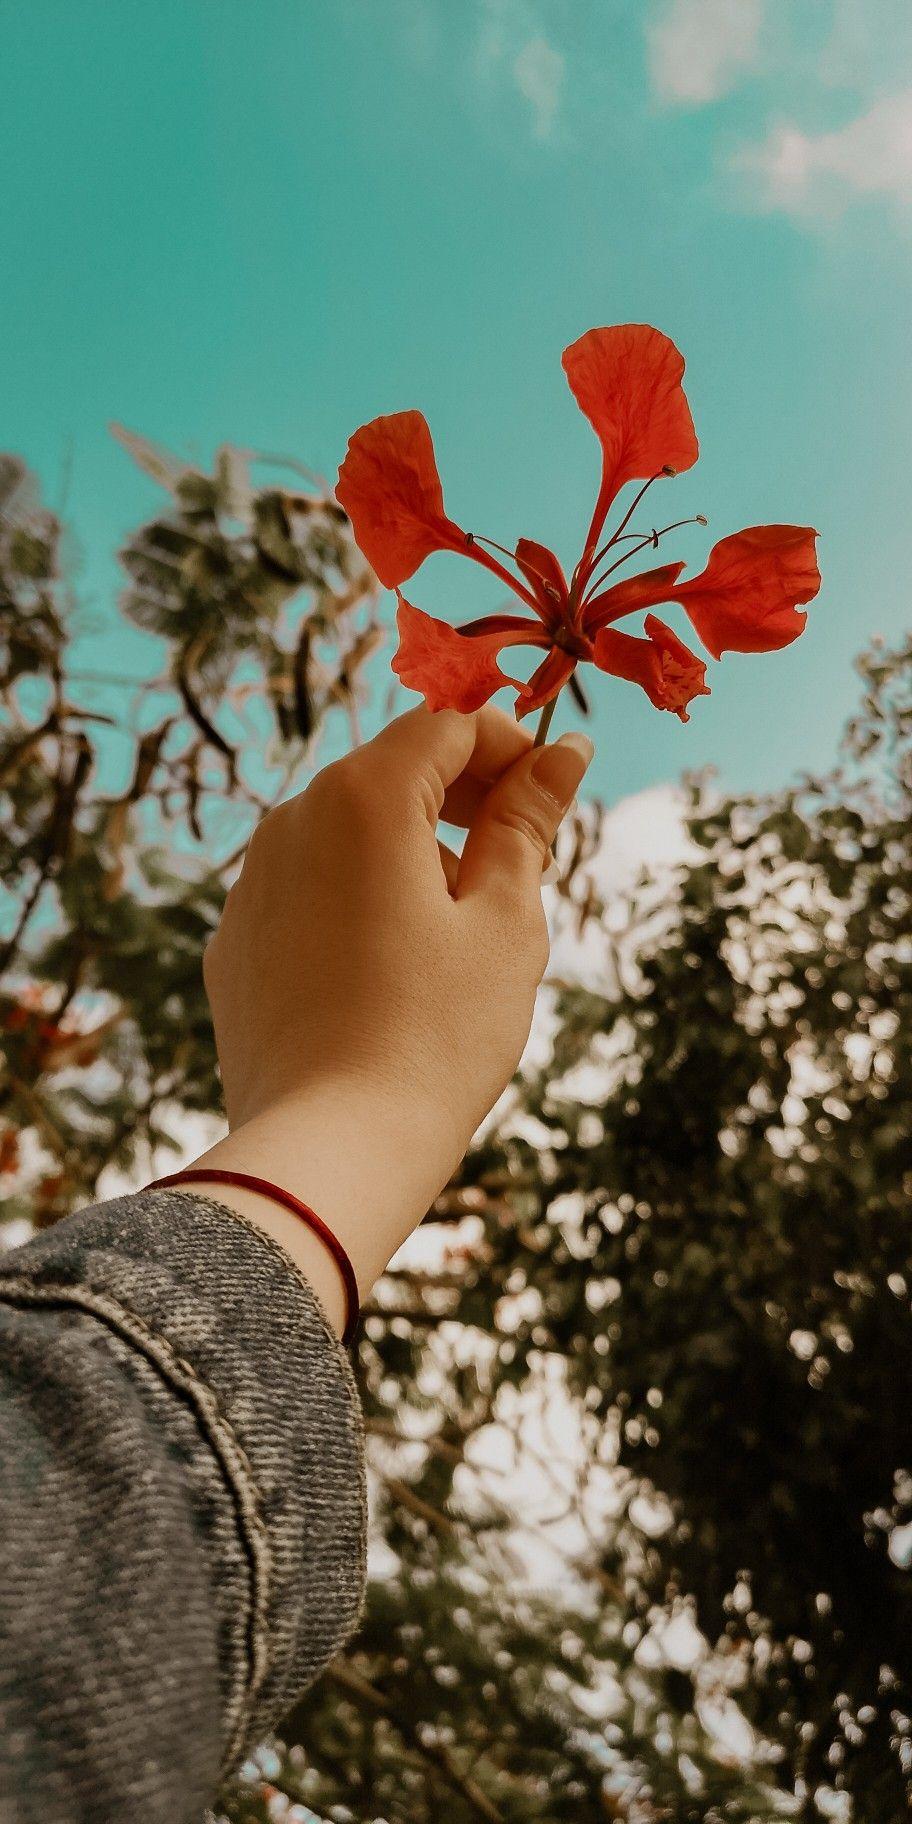 Pin By عراقية كشخة On صور خلفيات Girls With Flowers Cute Photography Photo Ideas Girl